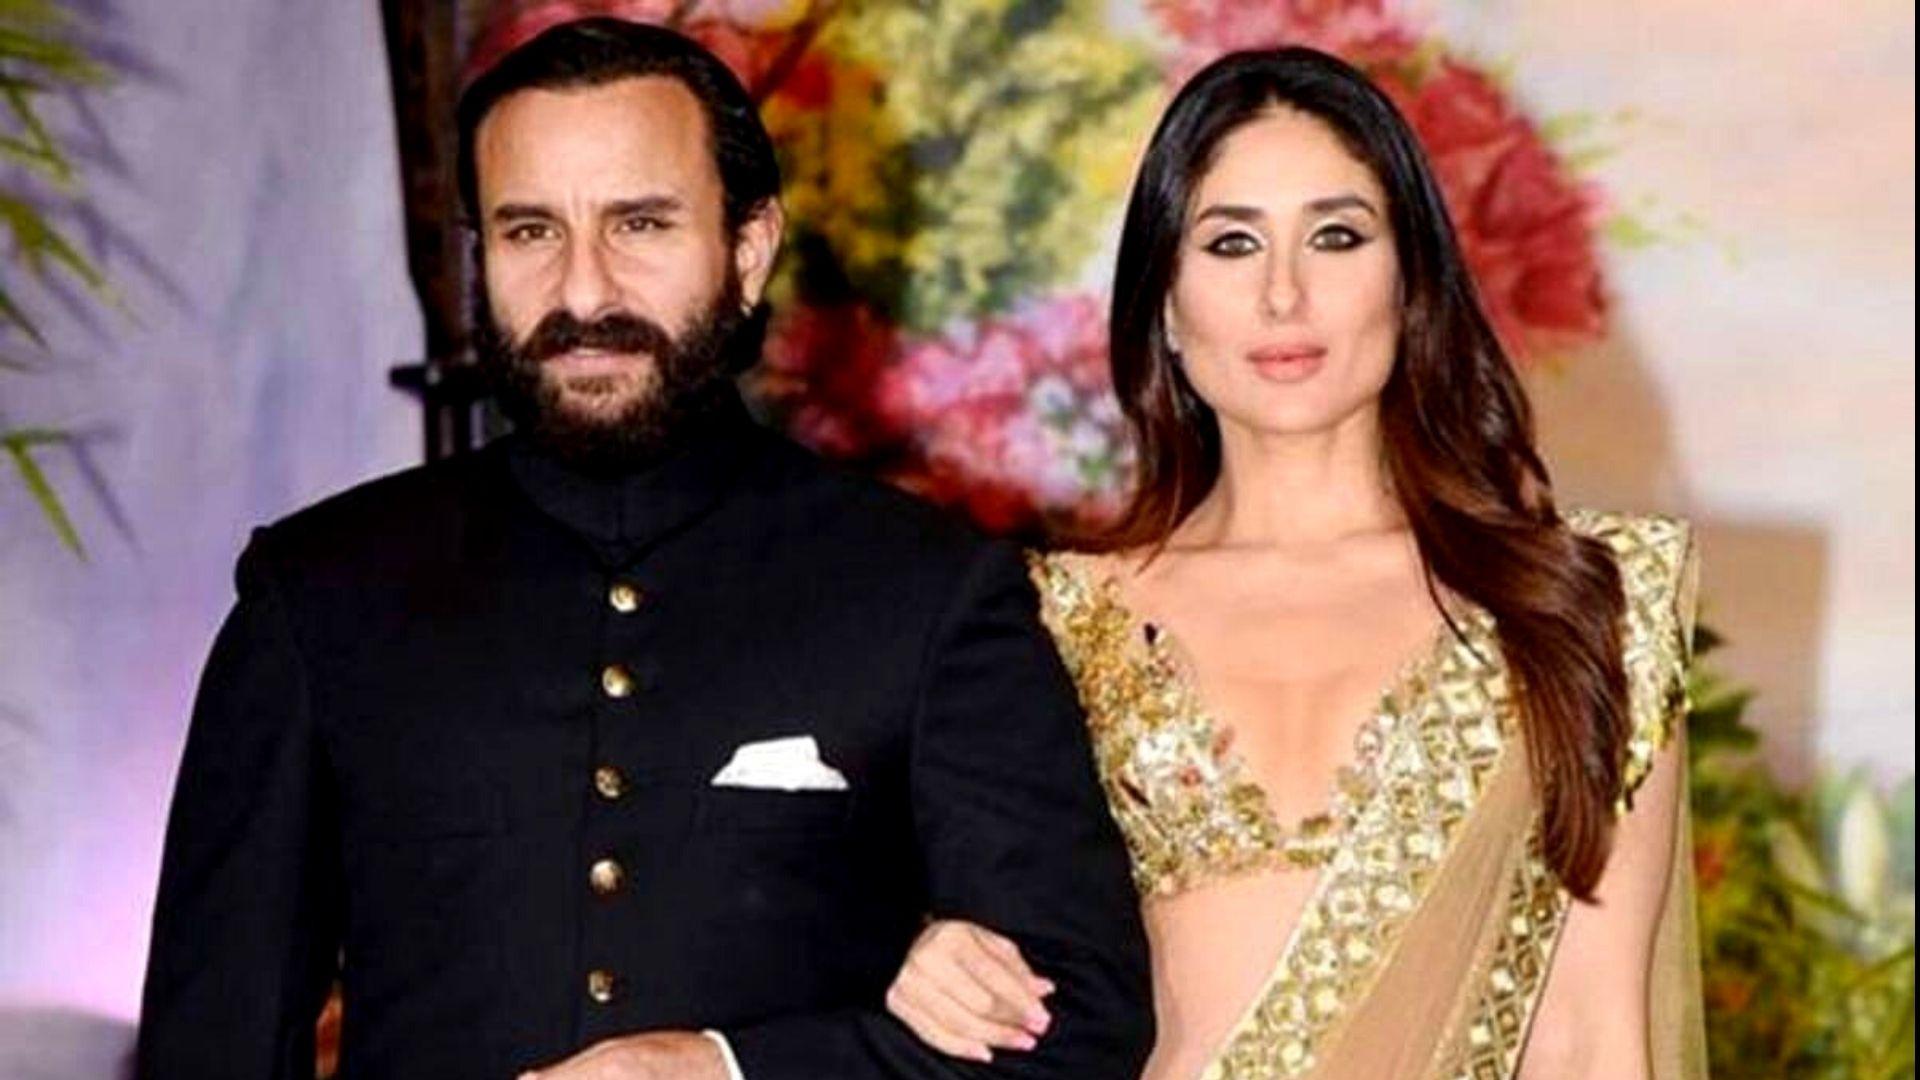 Kareena Kapoor And Saif Ali Khan Wedding Anniversary: Lessons That Saifeena Give Us On A Happy Marriage